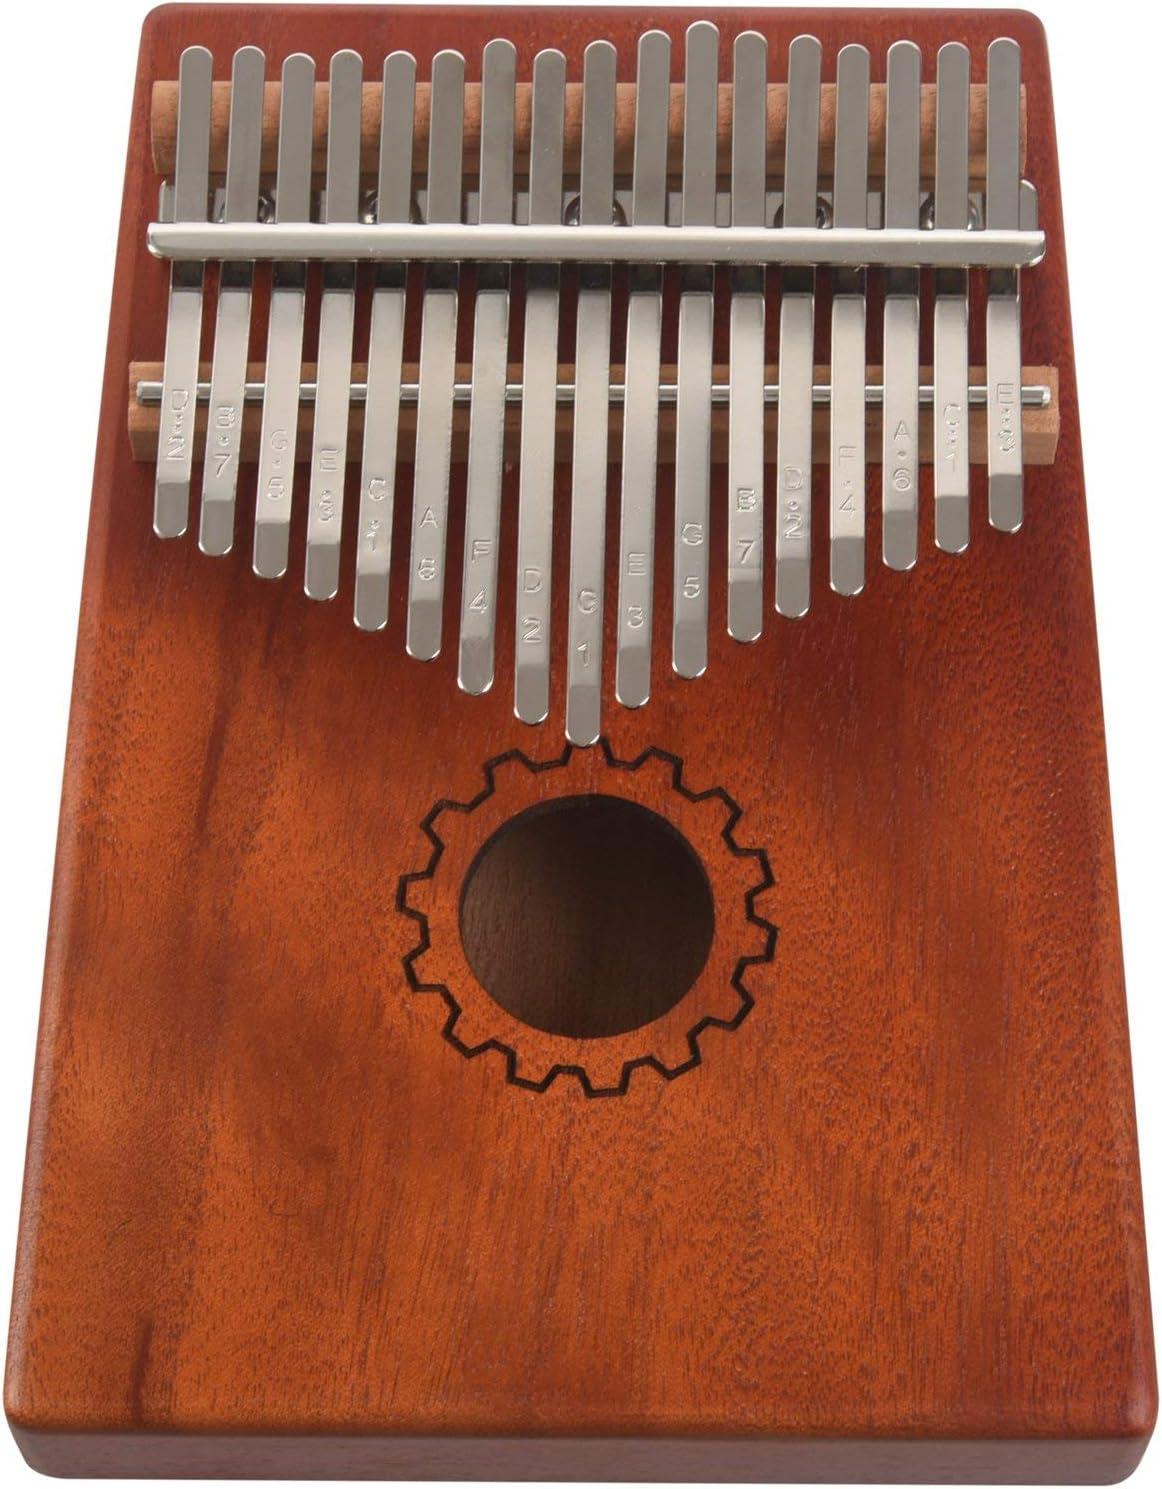 CUHAWUDBA Kalimba Thumb Piano 17 Teclas Con Madera De